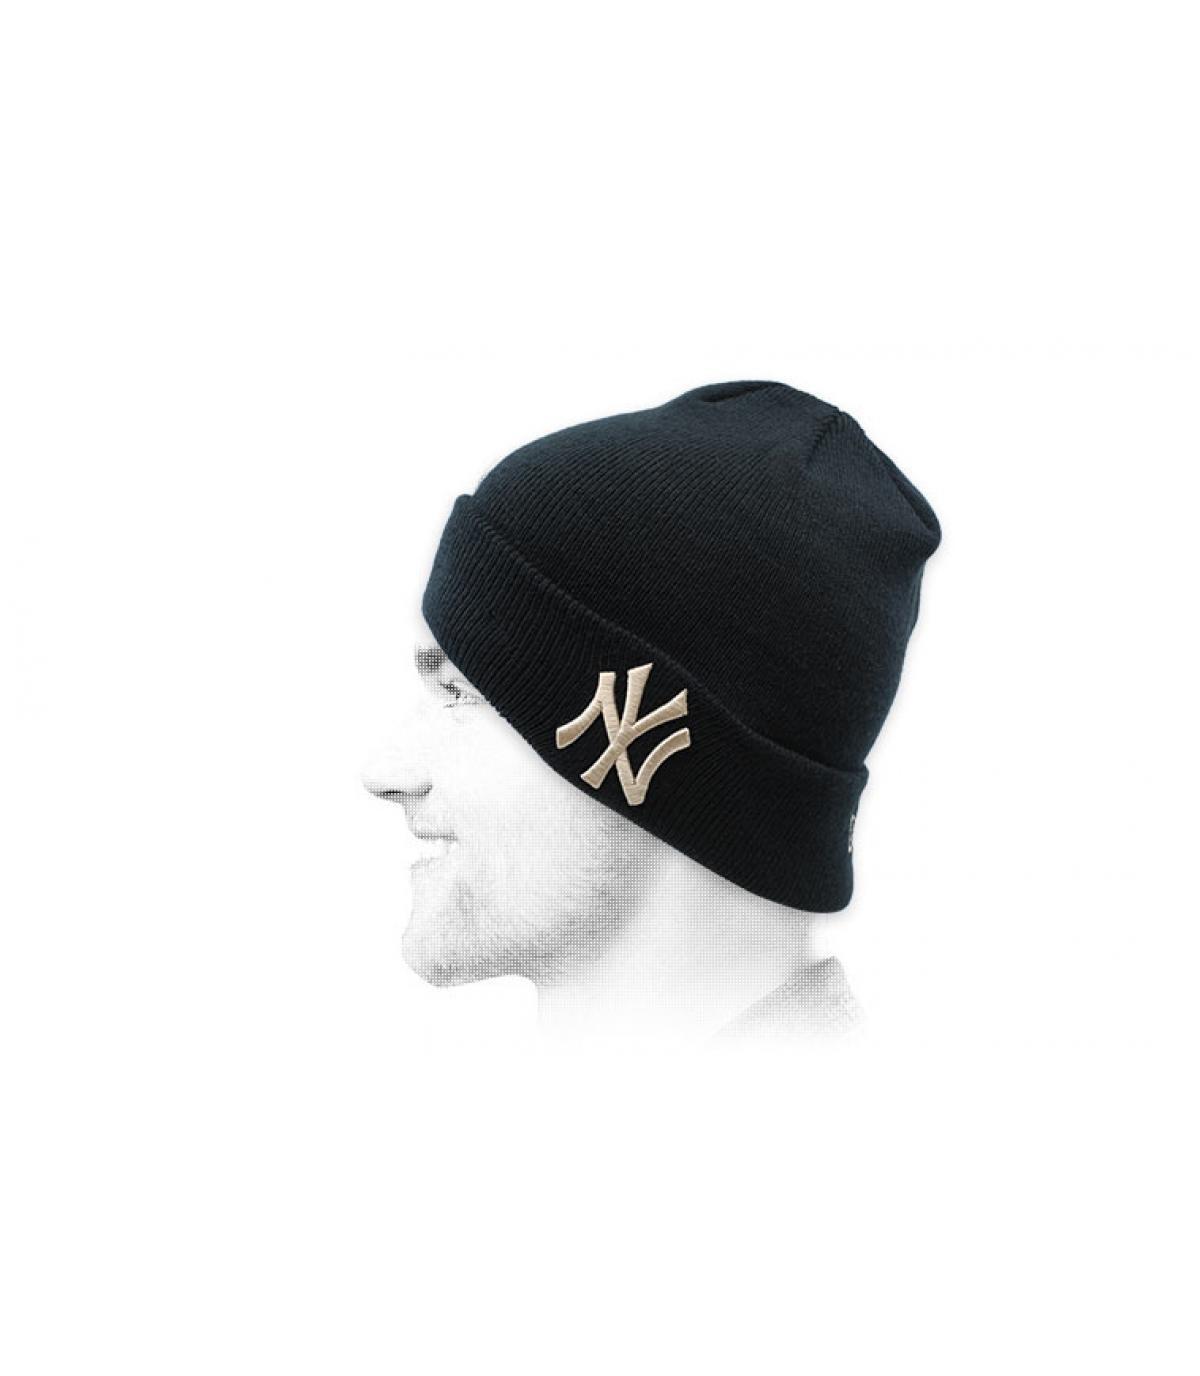 Mütze Revers NY blau